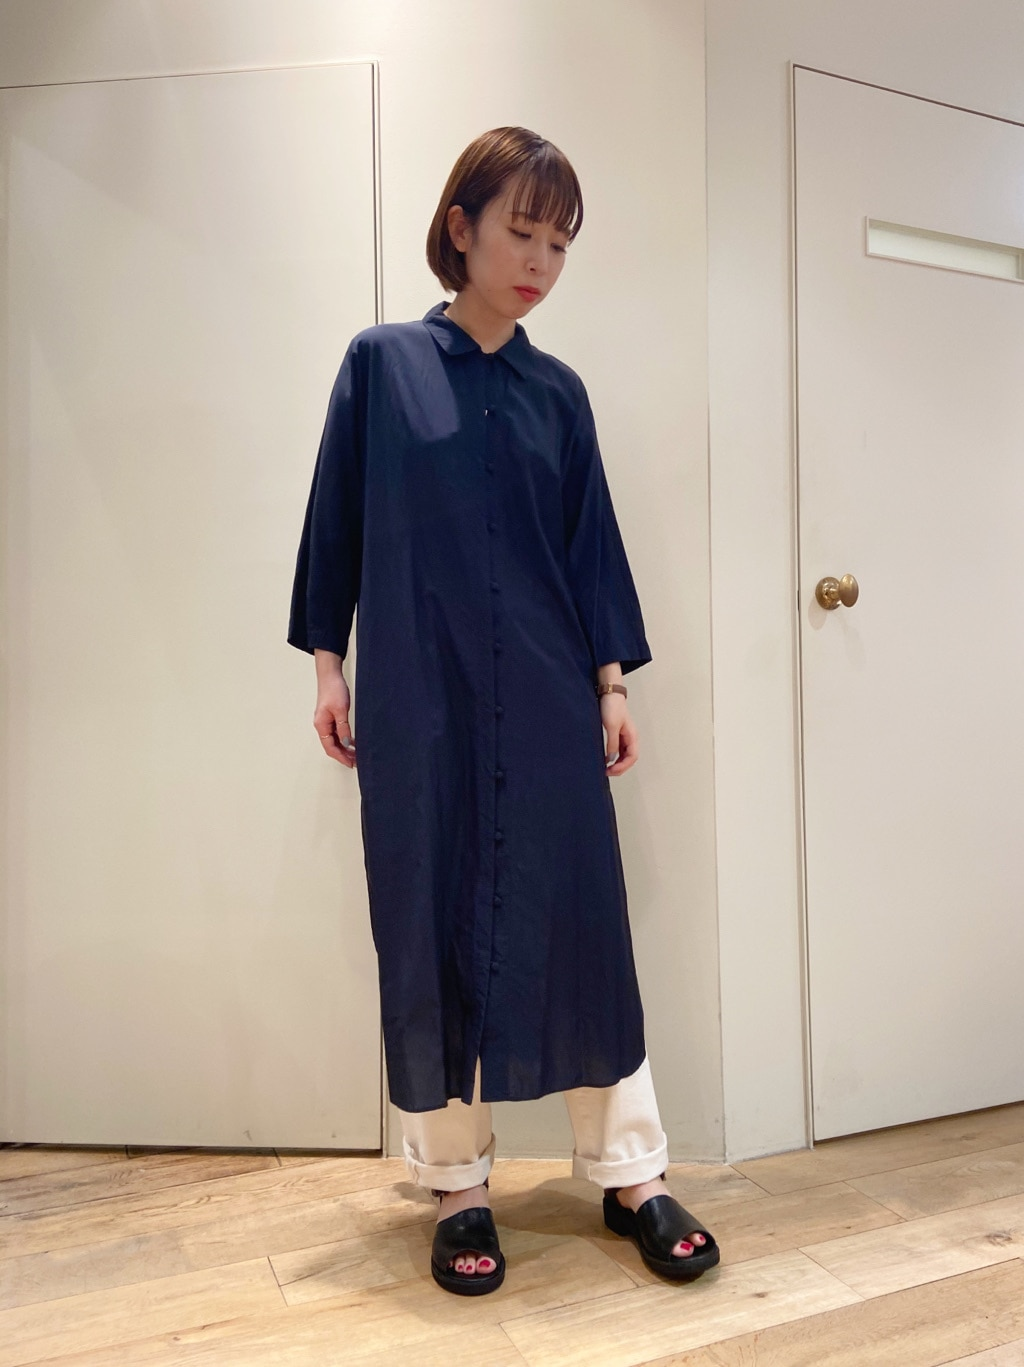 bulle de savon 新宿ミロード 身長:157cm 2020.07.29